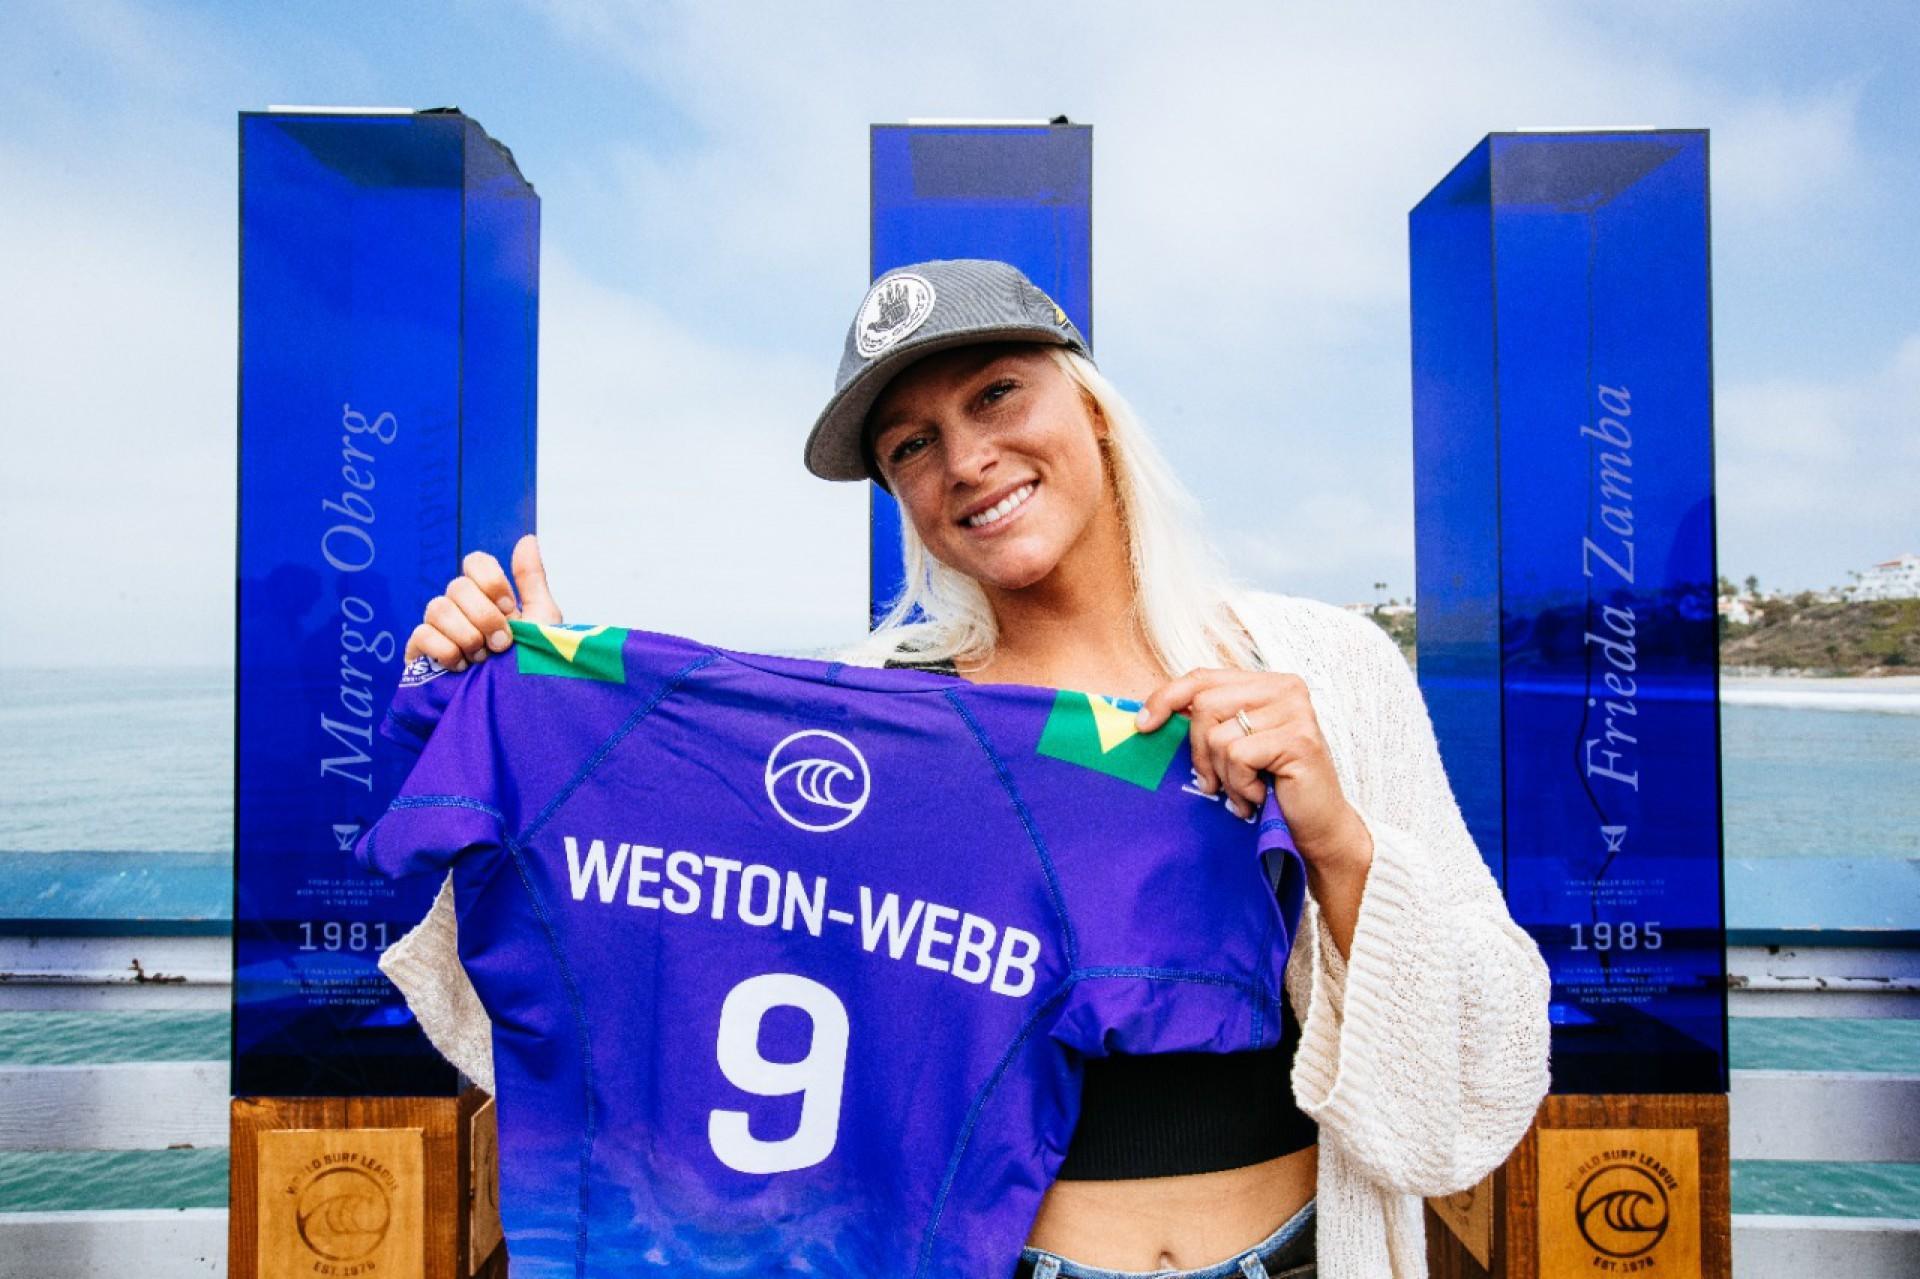 Tatiana Weston-Webb ficou com o vice após ser derrotada por Carissa Moore no WSL Finals de surfe (Foto: © WSL / Diz SOCIAL : @wsl @thiagodiz)